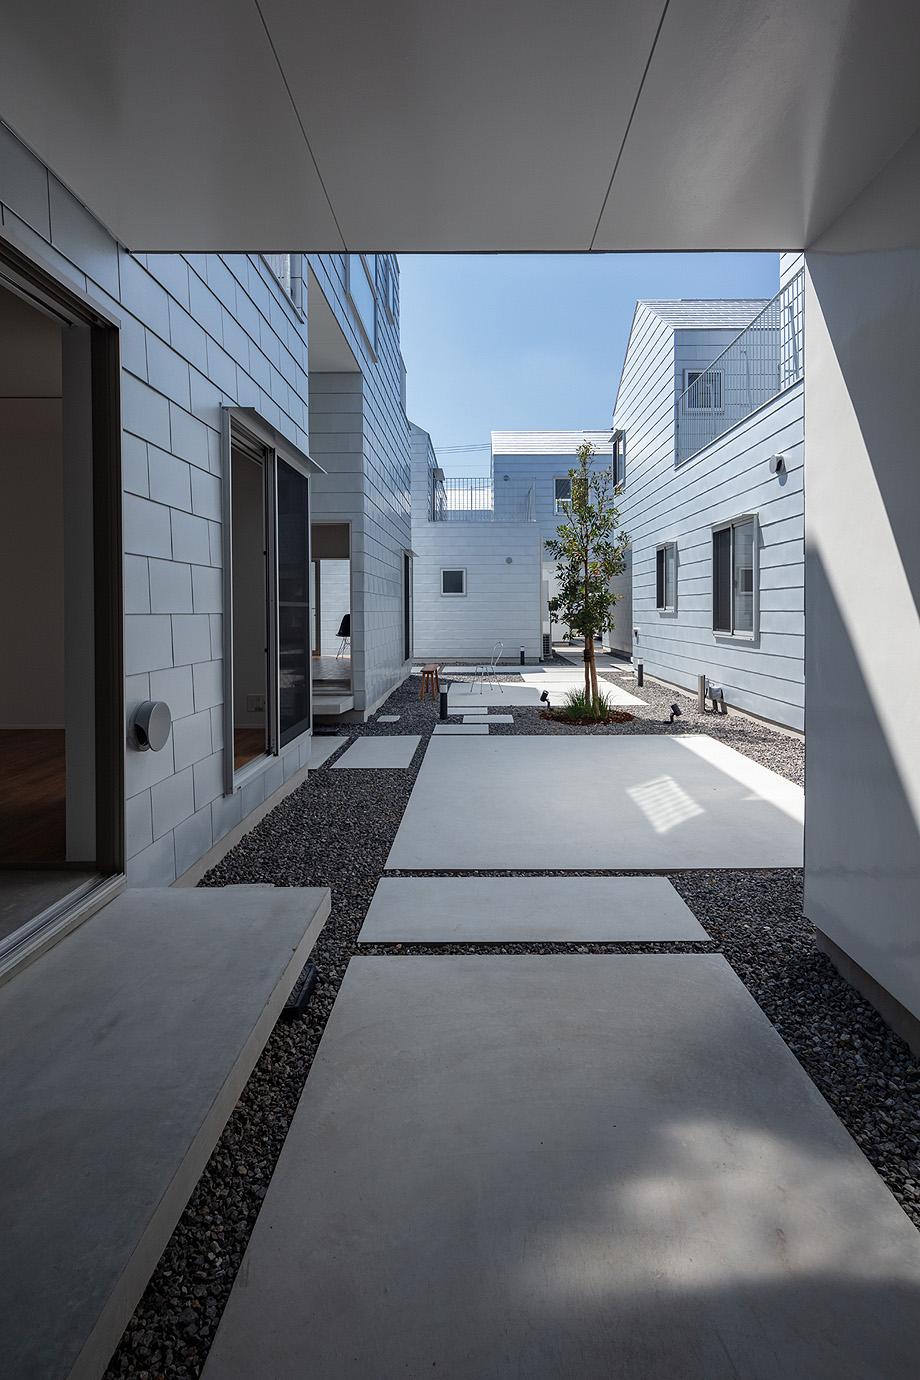 apartamentos de alquiler de masahiko fujimori - foto shigeo owaga (8)